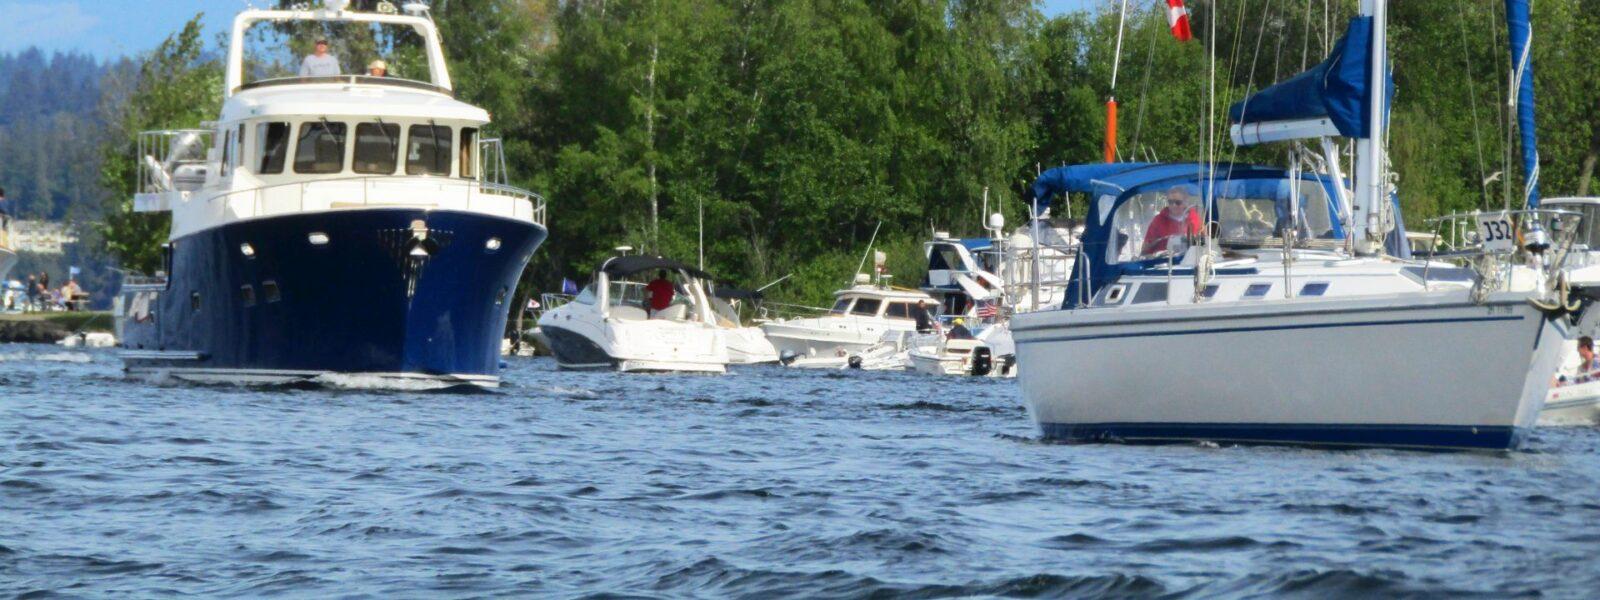 Seattle Easter Boat Parade, Seattle WA, NW Marinas, New Boats, Sailboats, Skiff life, Salty Dog Boating